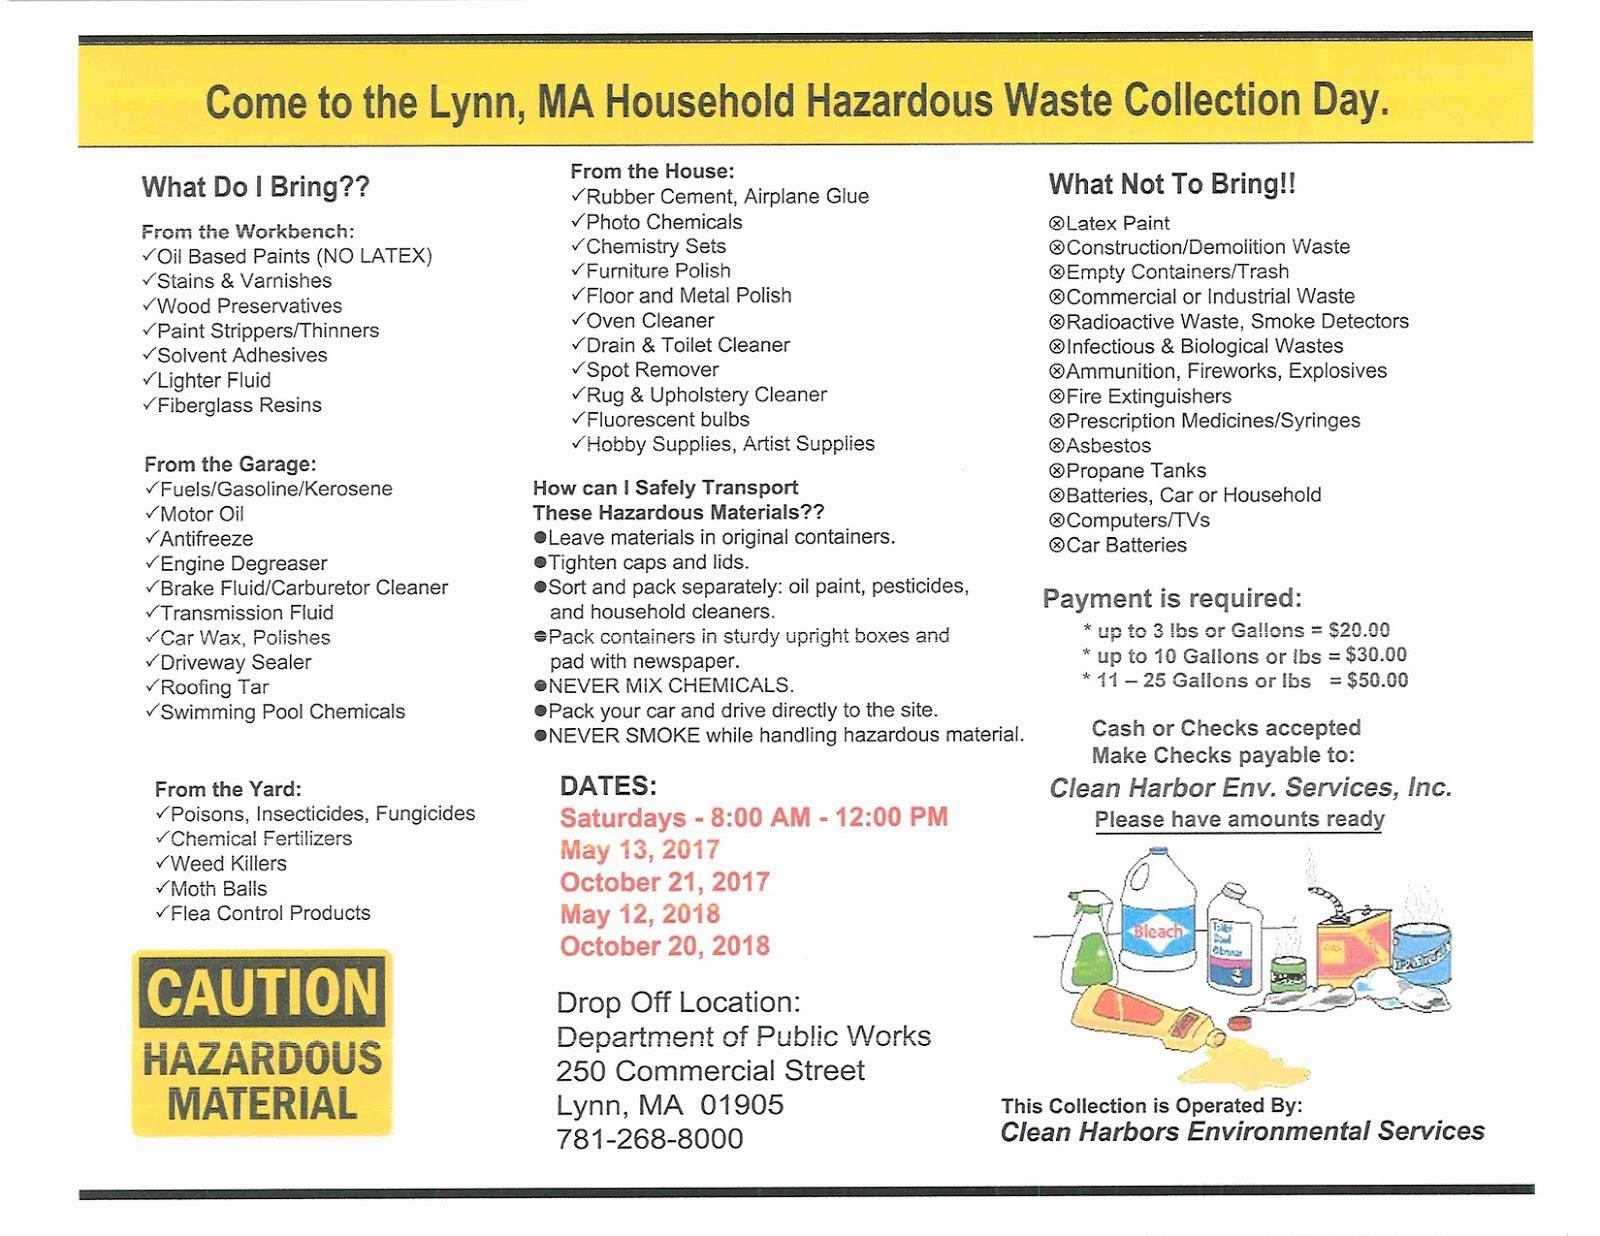 TrashTalkin Lynn Household Hazardous Waste Day is Saturday May 13